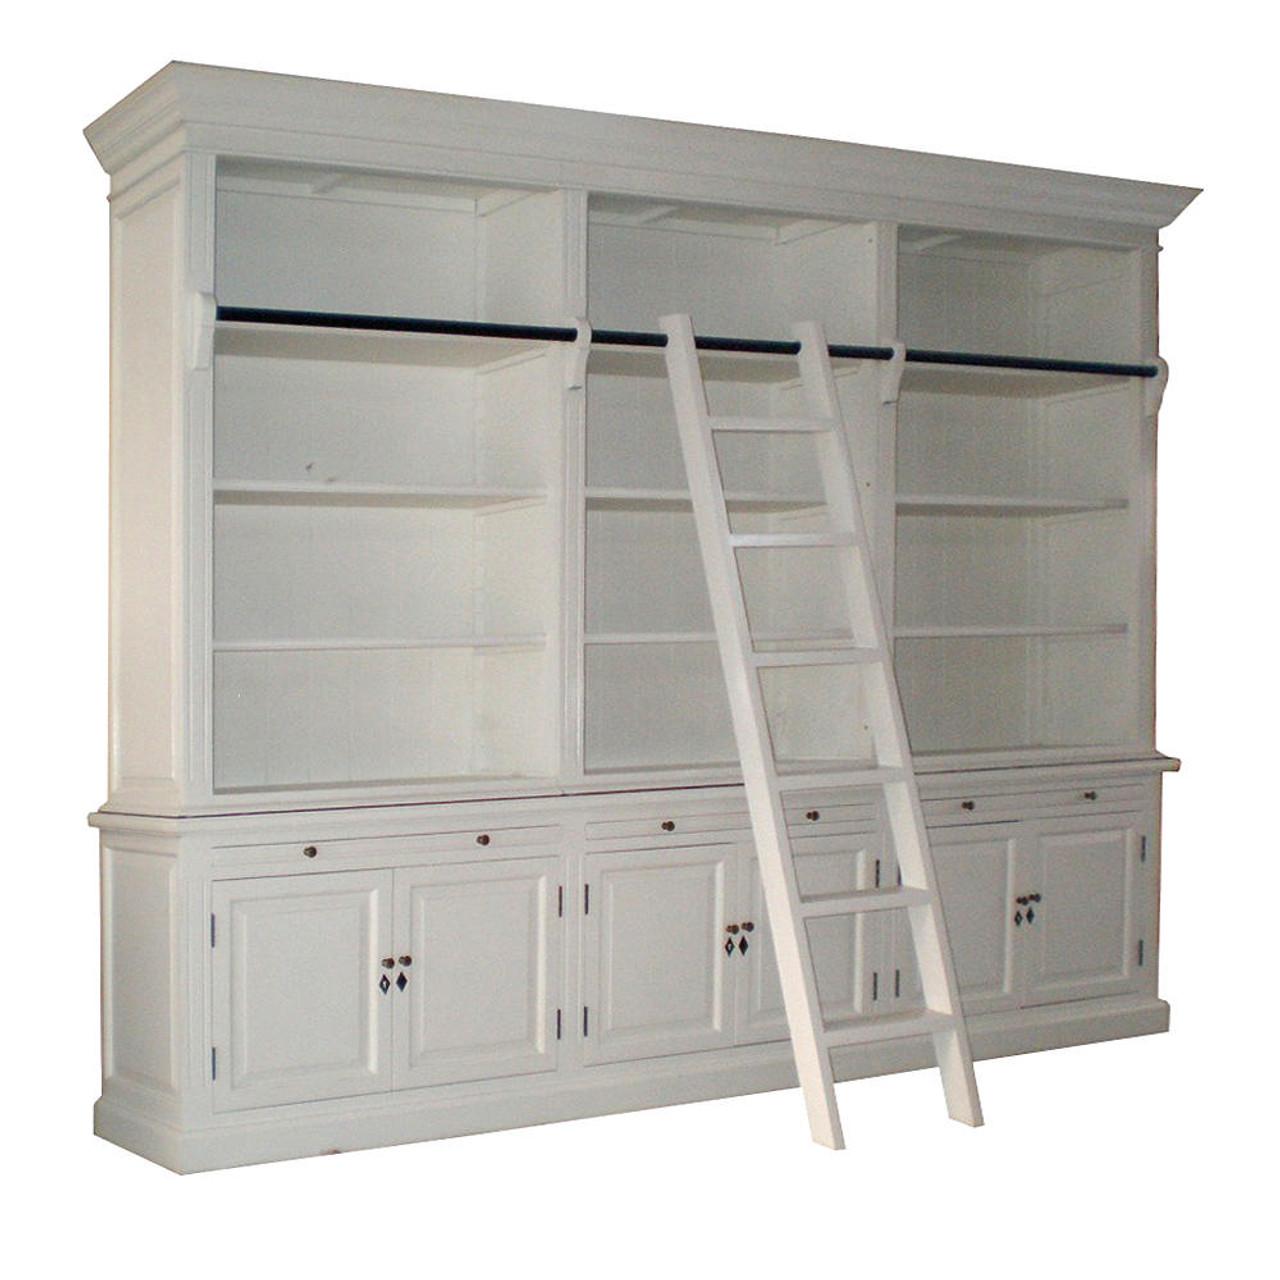 Harrington 3 Bay Library Bookcase No Ladder White